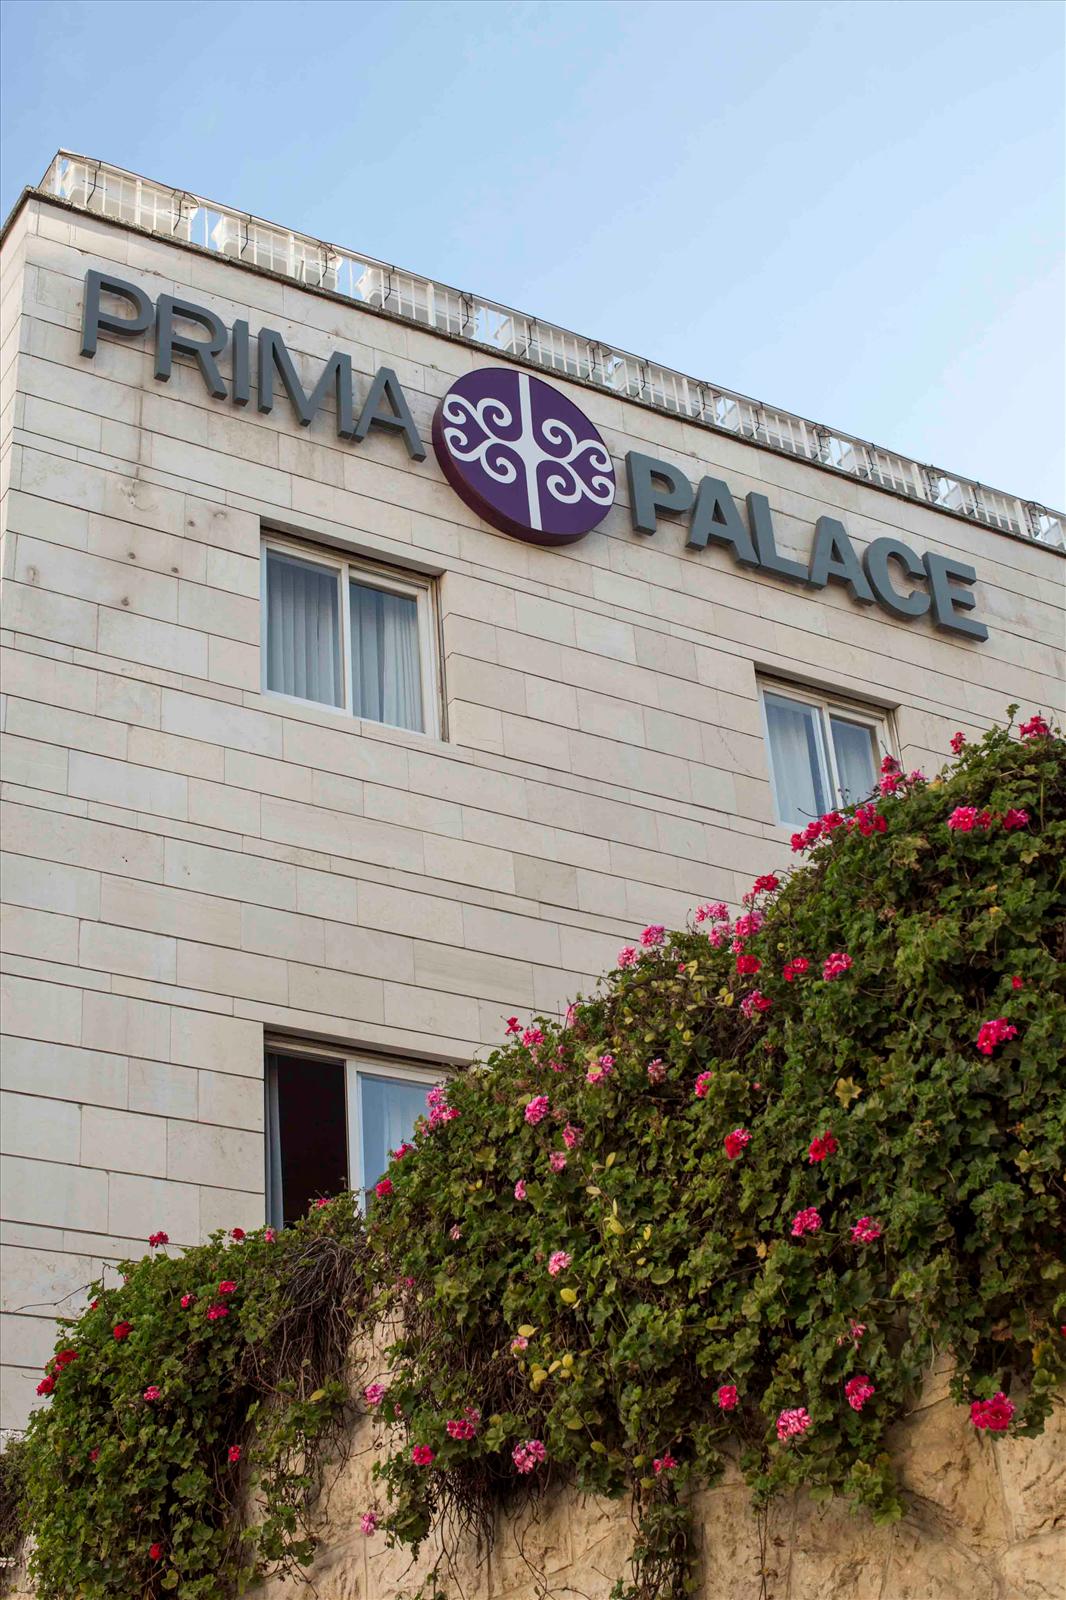 Prima Palace